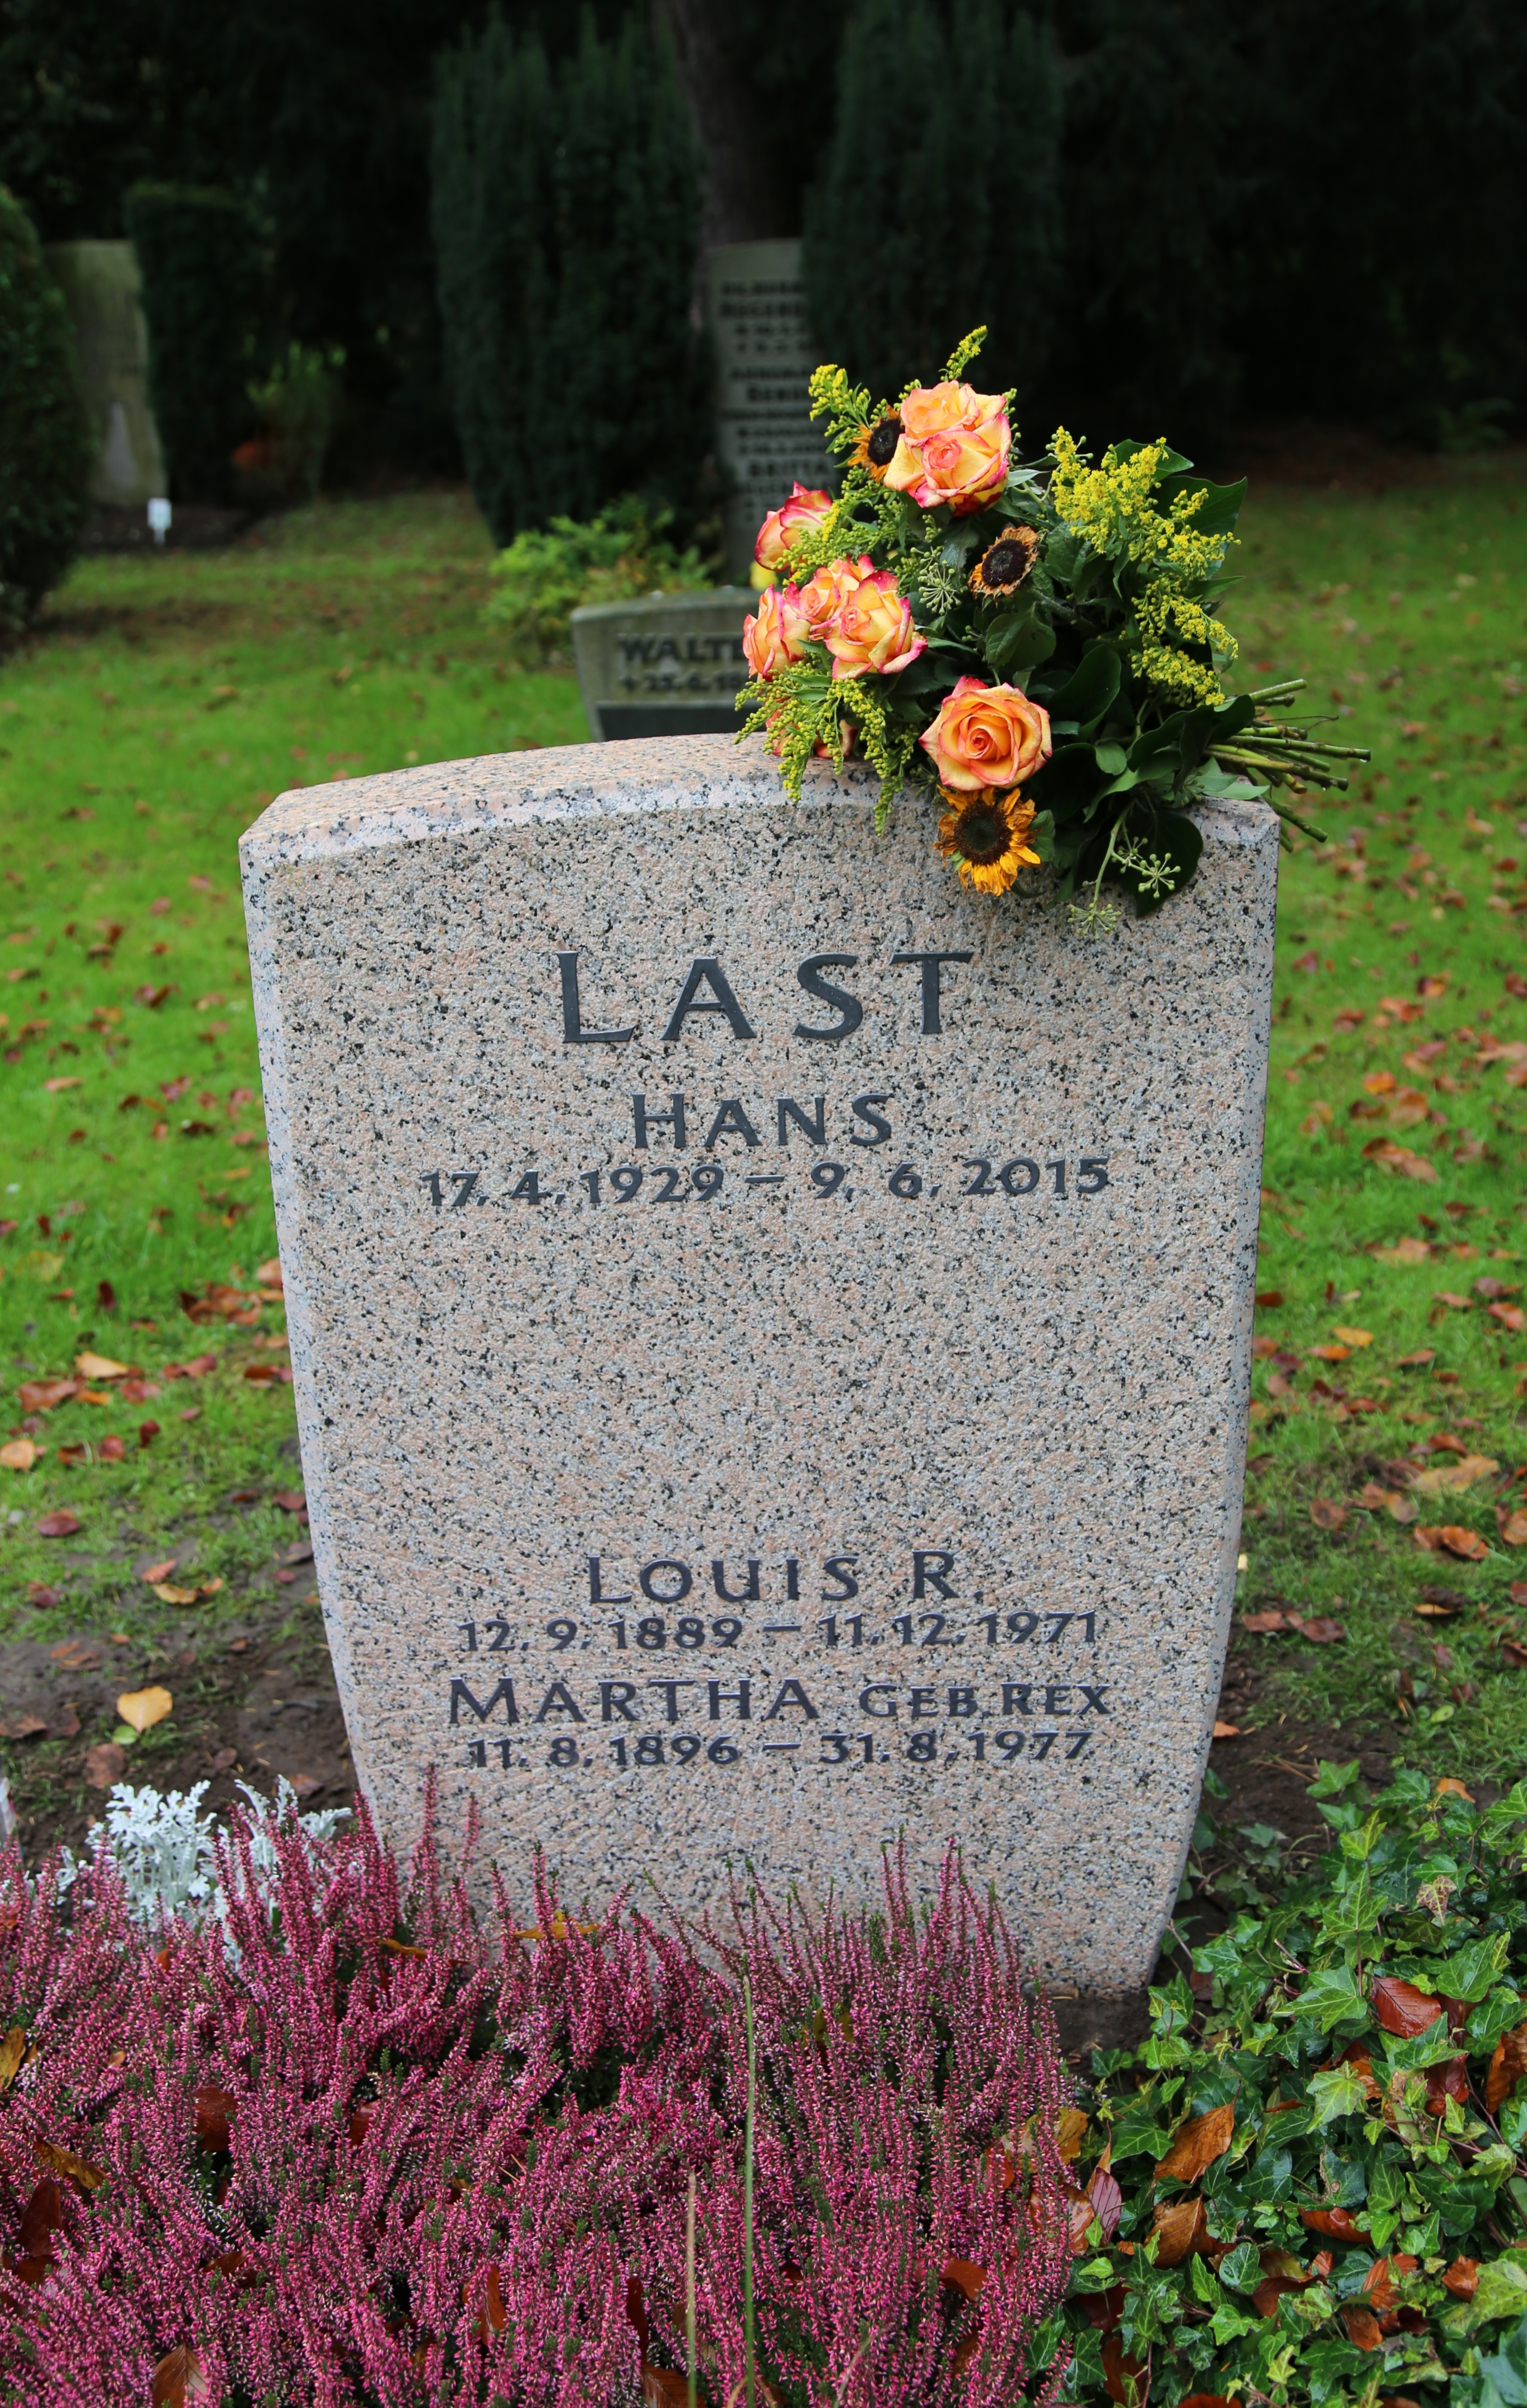 James Last Todesursache